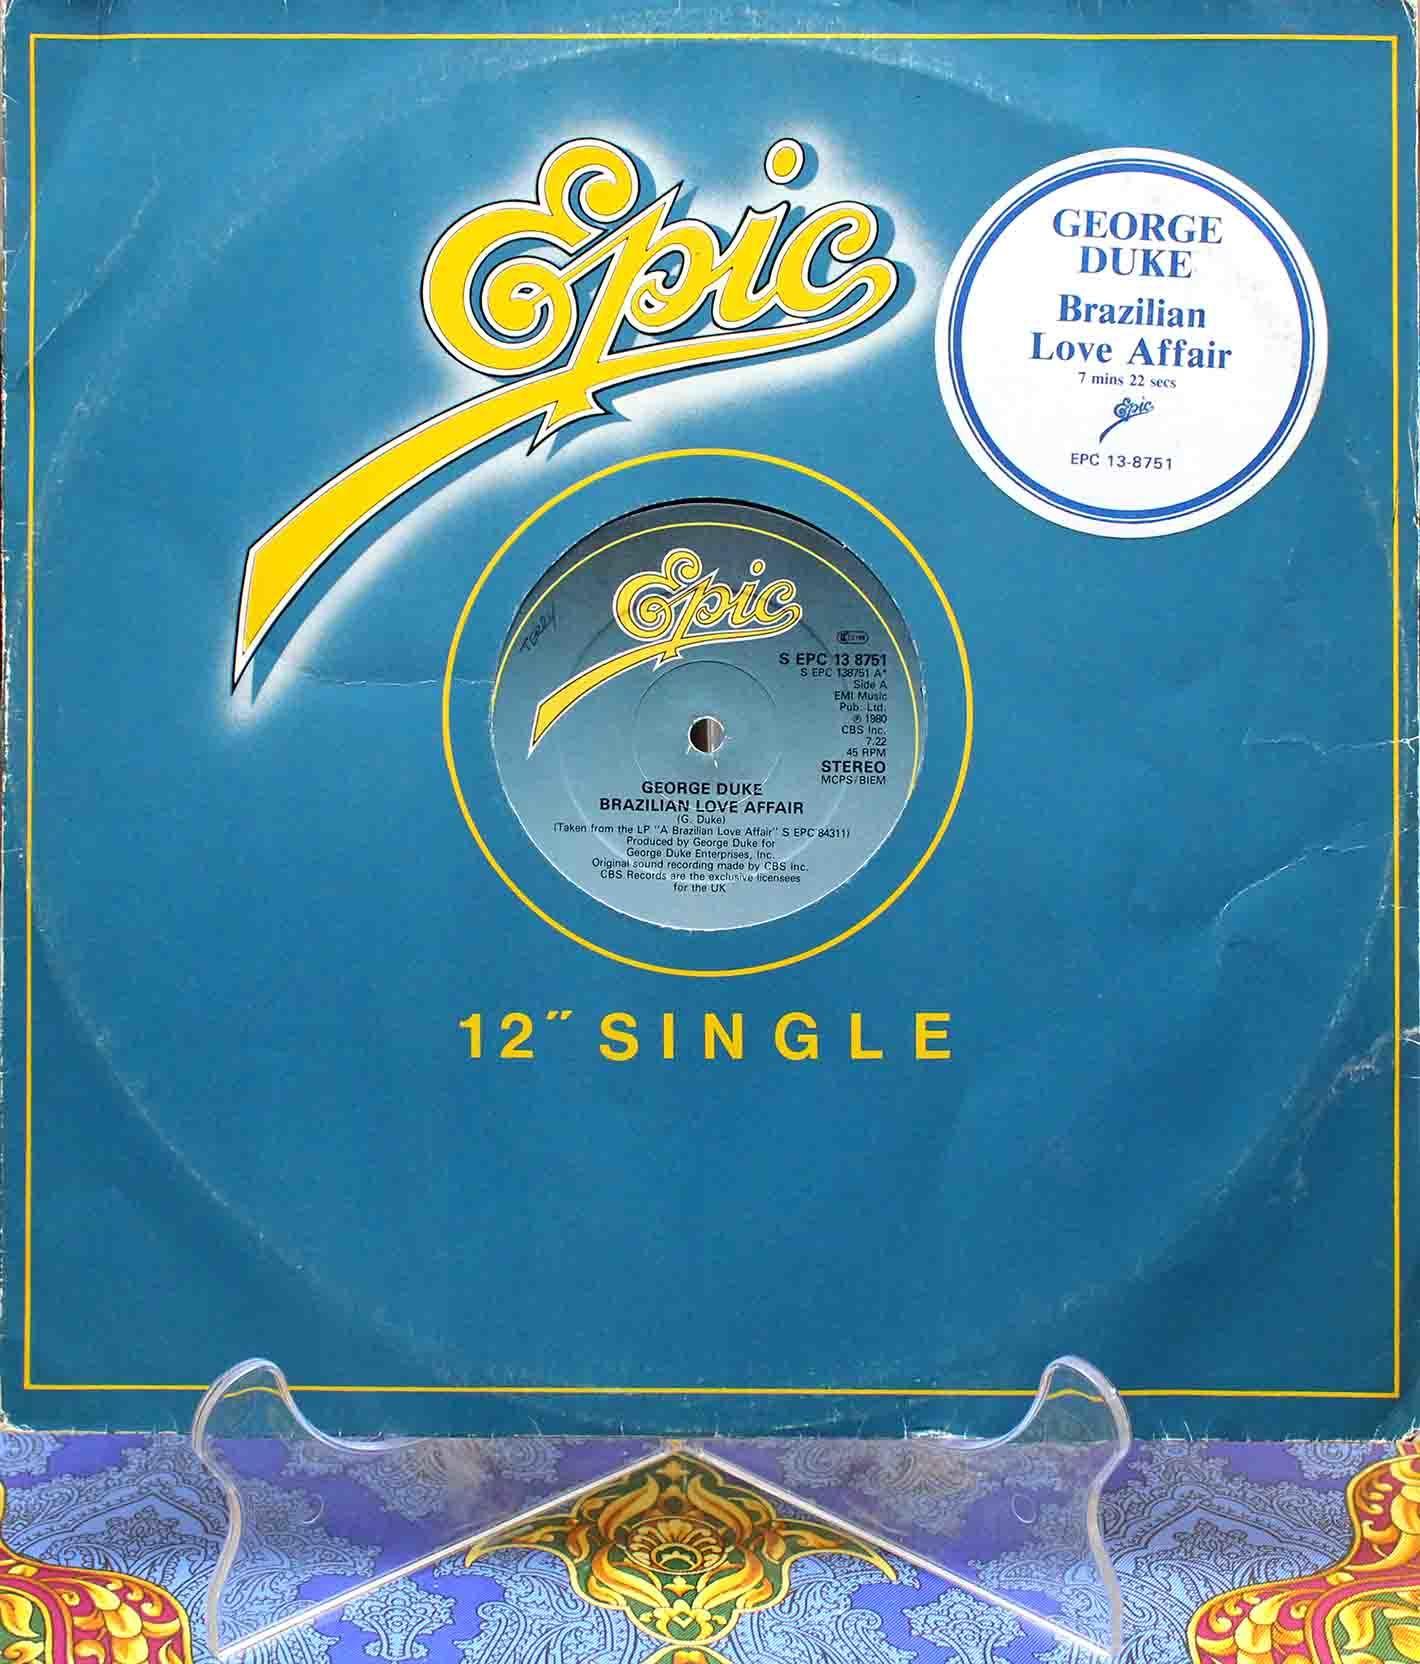 George Duke – Brazilian Love Affair 01